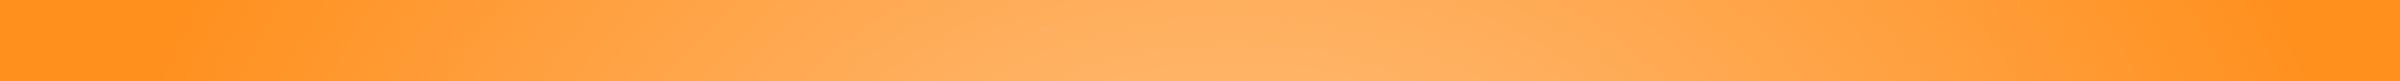 OrangeBackSM2.jpg